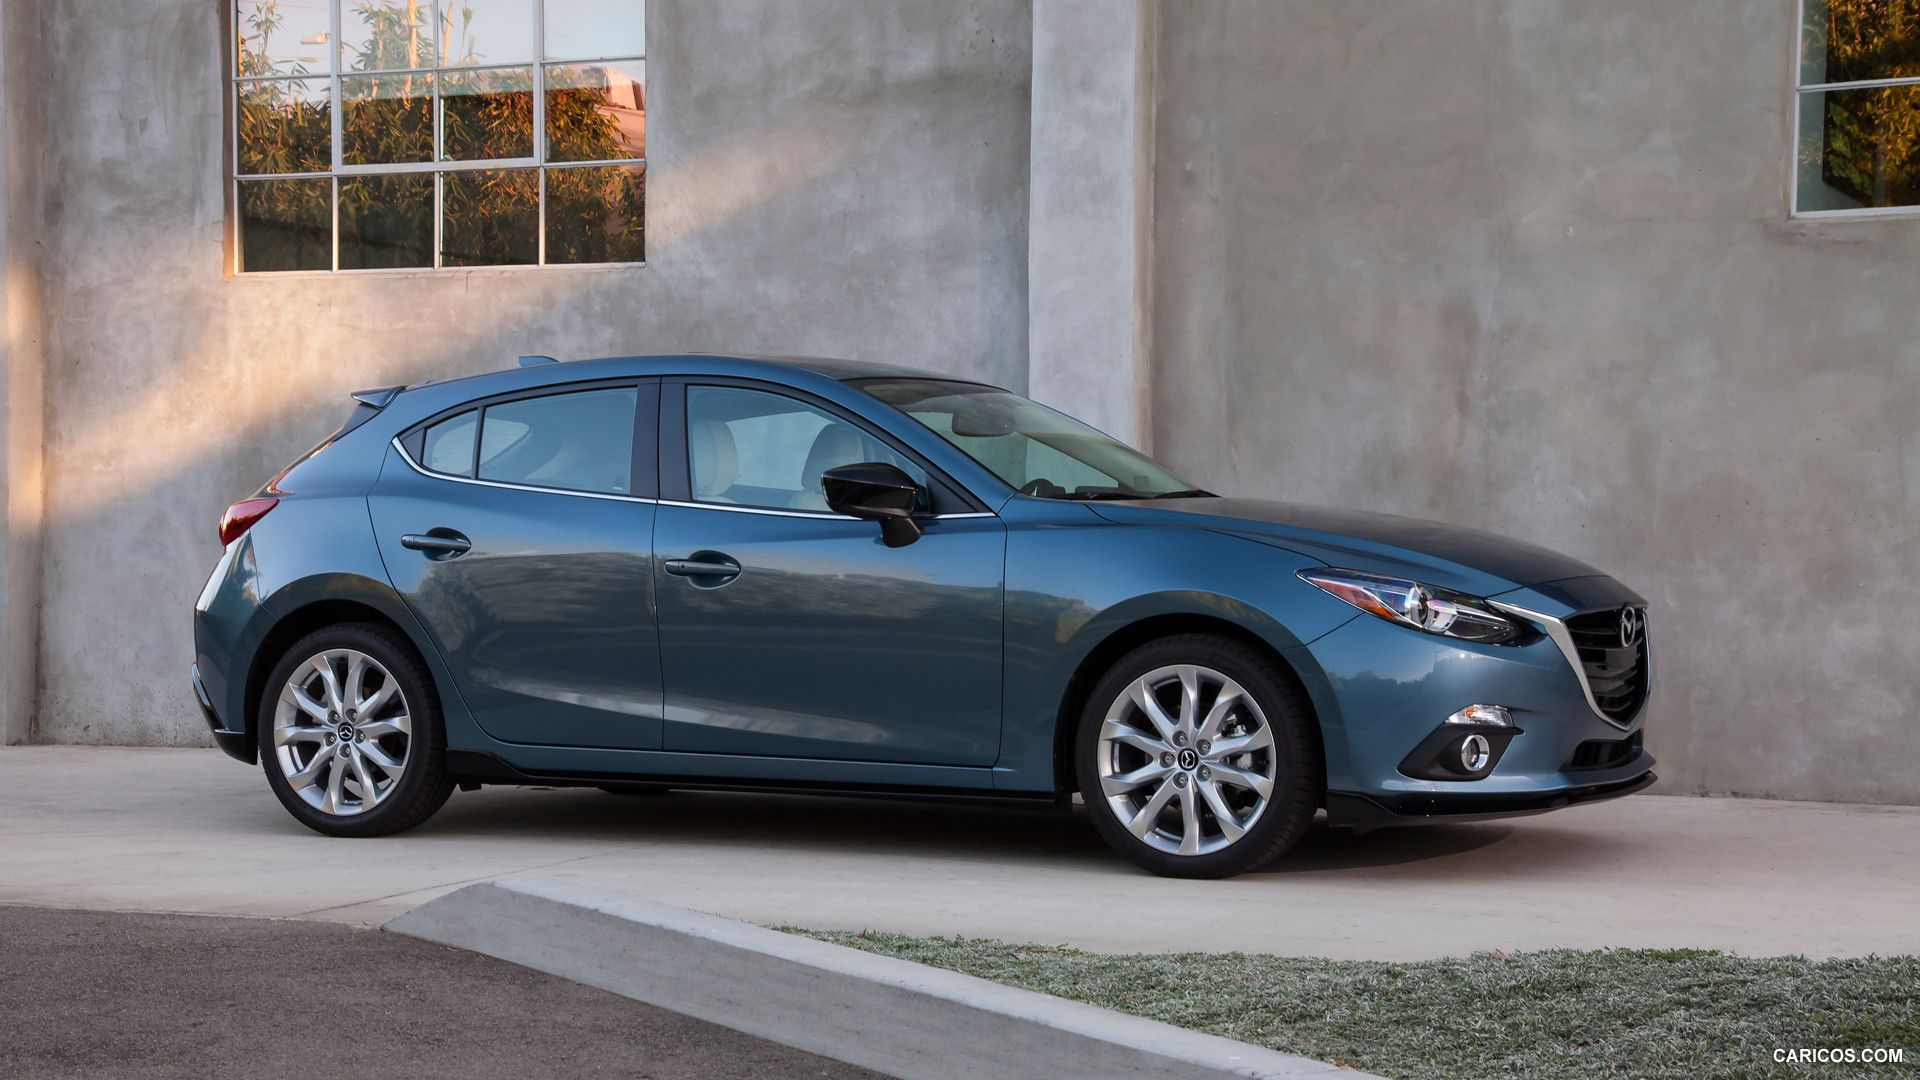 Mazda 3 Sport Vs Touring >> 2015 Mazda 3 5d S Touring 6mt Blue Reflex Side Hd